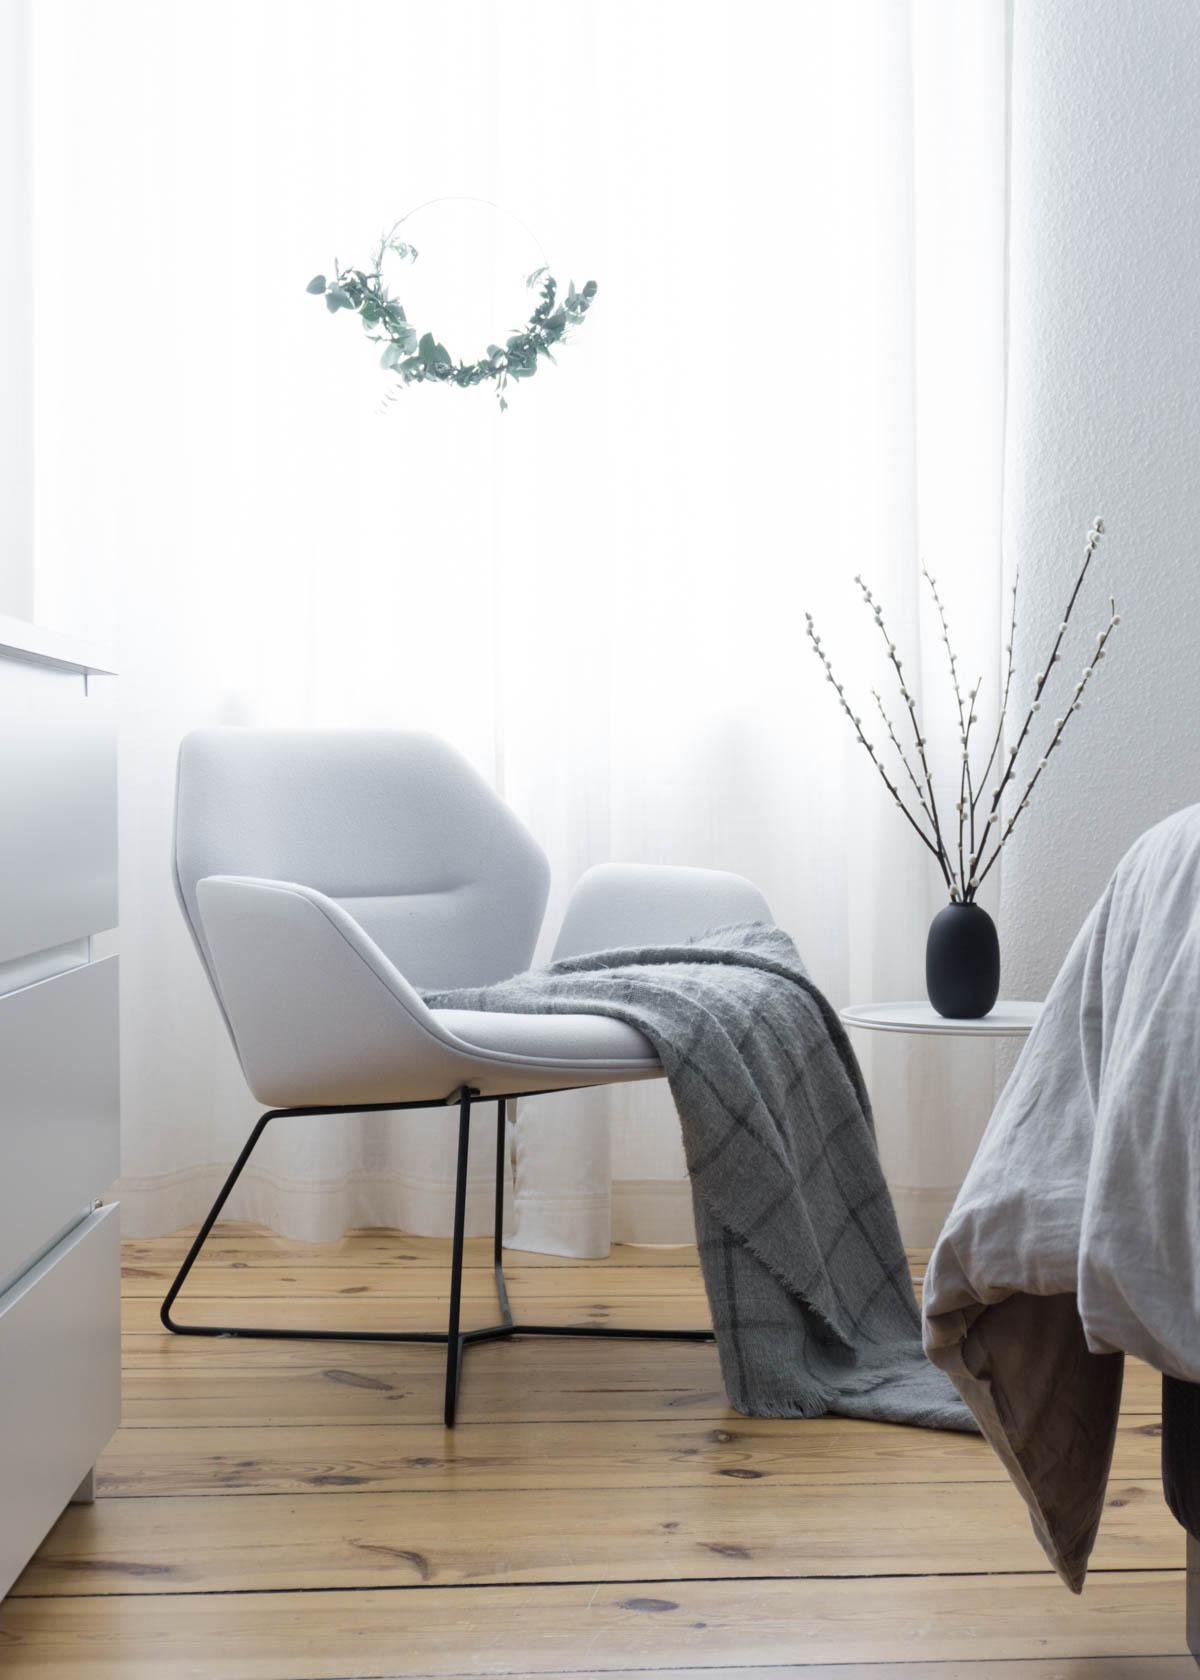 Scandinavian Christmas Eucalyptus Wreath Cozy Bedroom Details Rg Daily